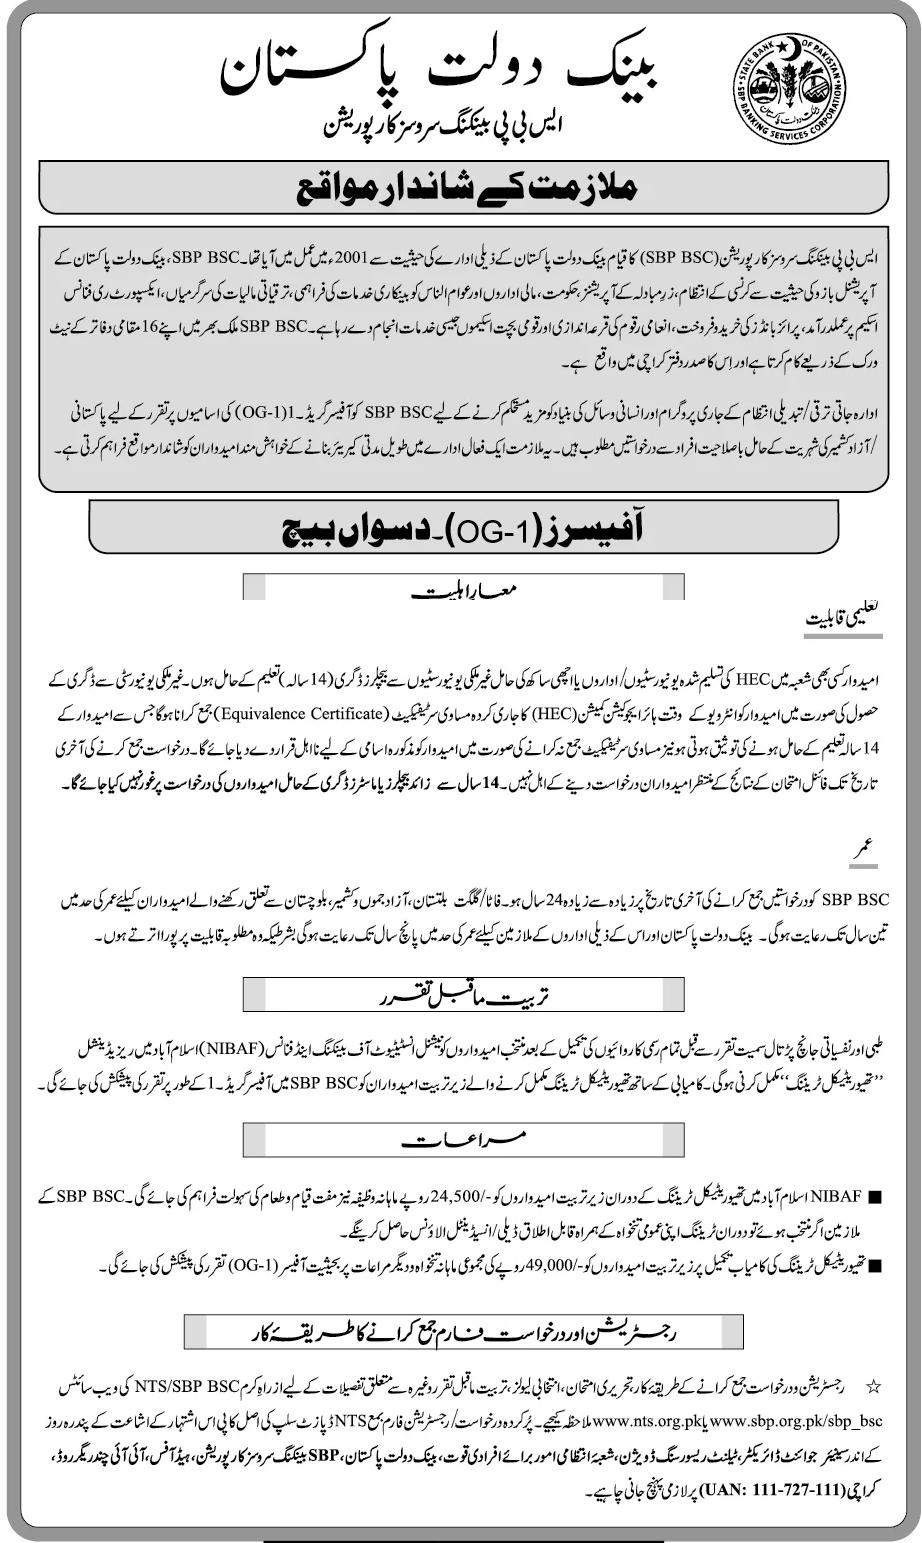 State Bank of Pakistan OG 1 Jobs 2019 10th Batch Application Form